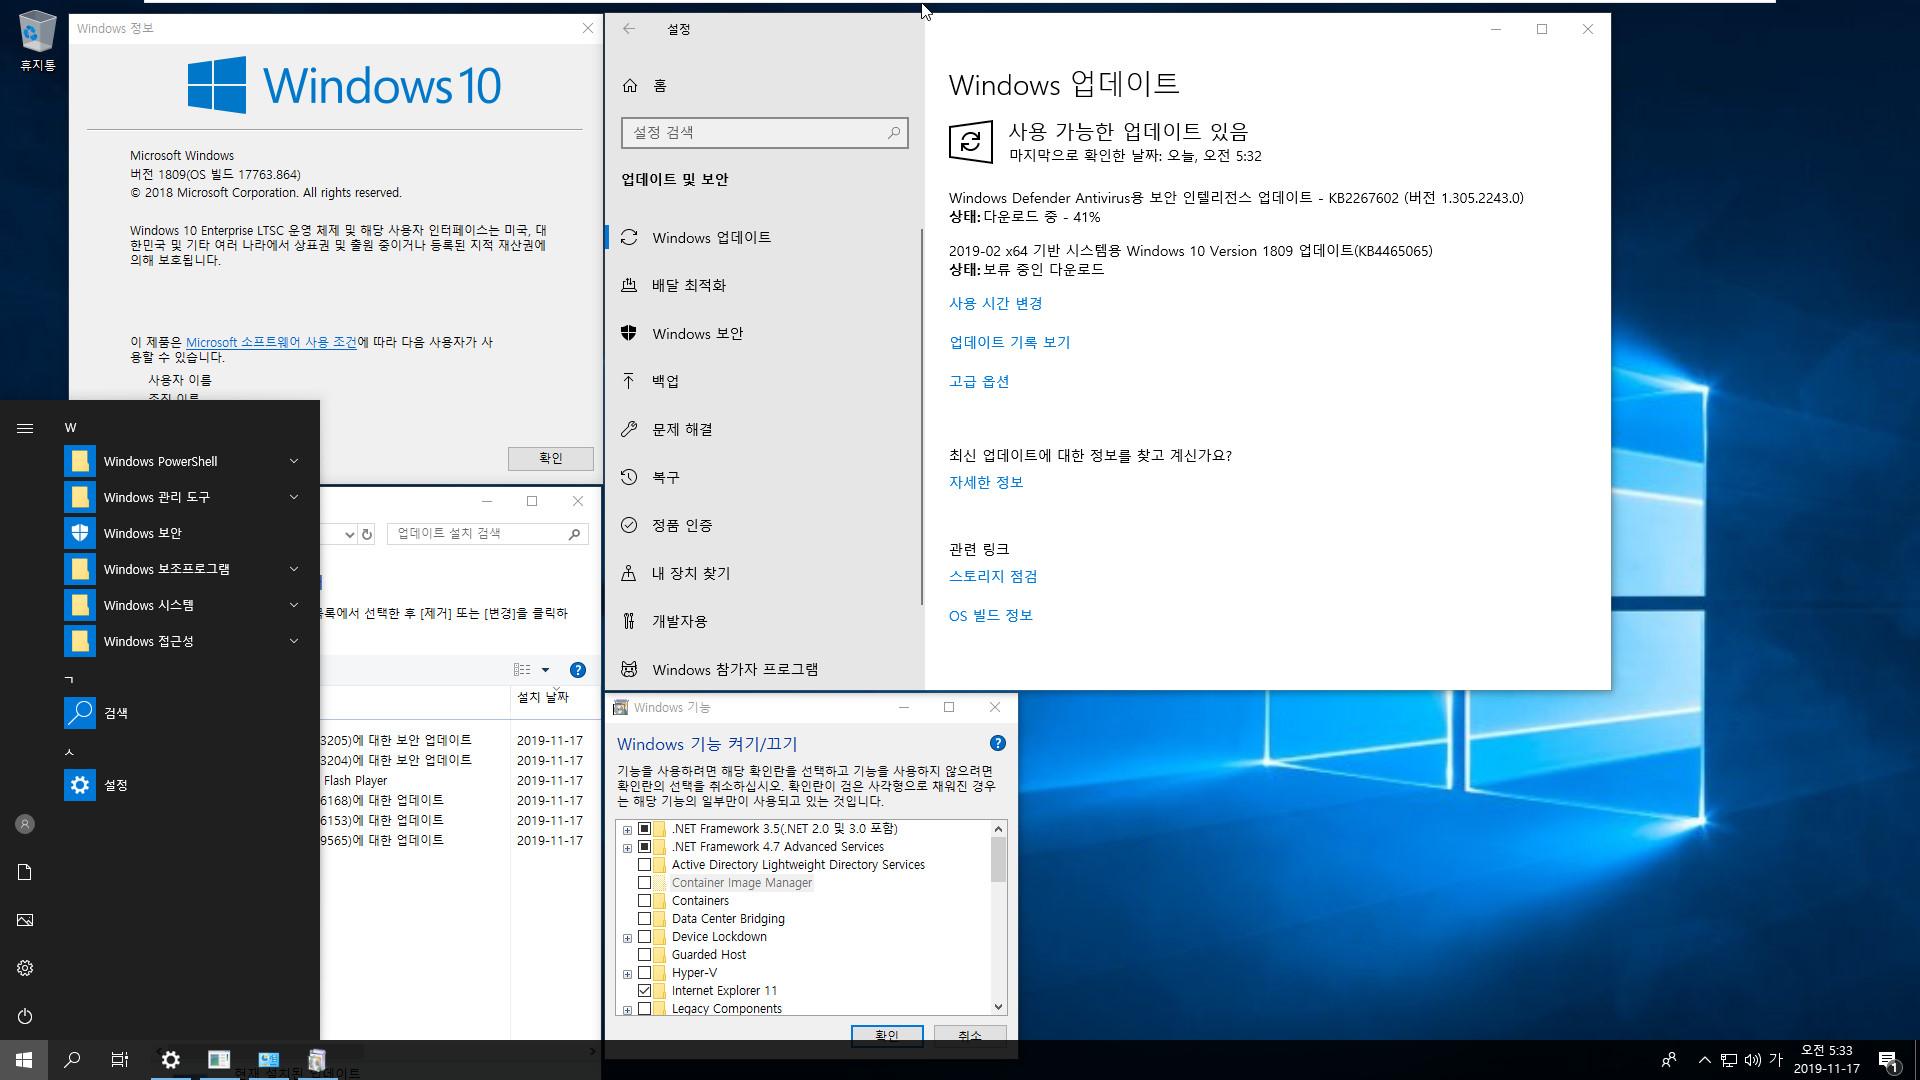 Windows 10 버전 1809 누적 업데이트 KB4523205 (OS 빌드 17763.864) [2019-11-12 일자] 중에 LTSC 2019 통합중 입니다 - 순정 상태입니다 2019-11-17_053327.jpg